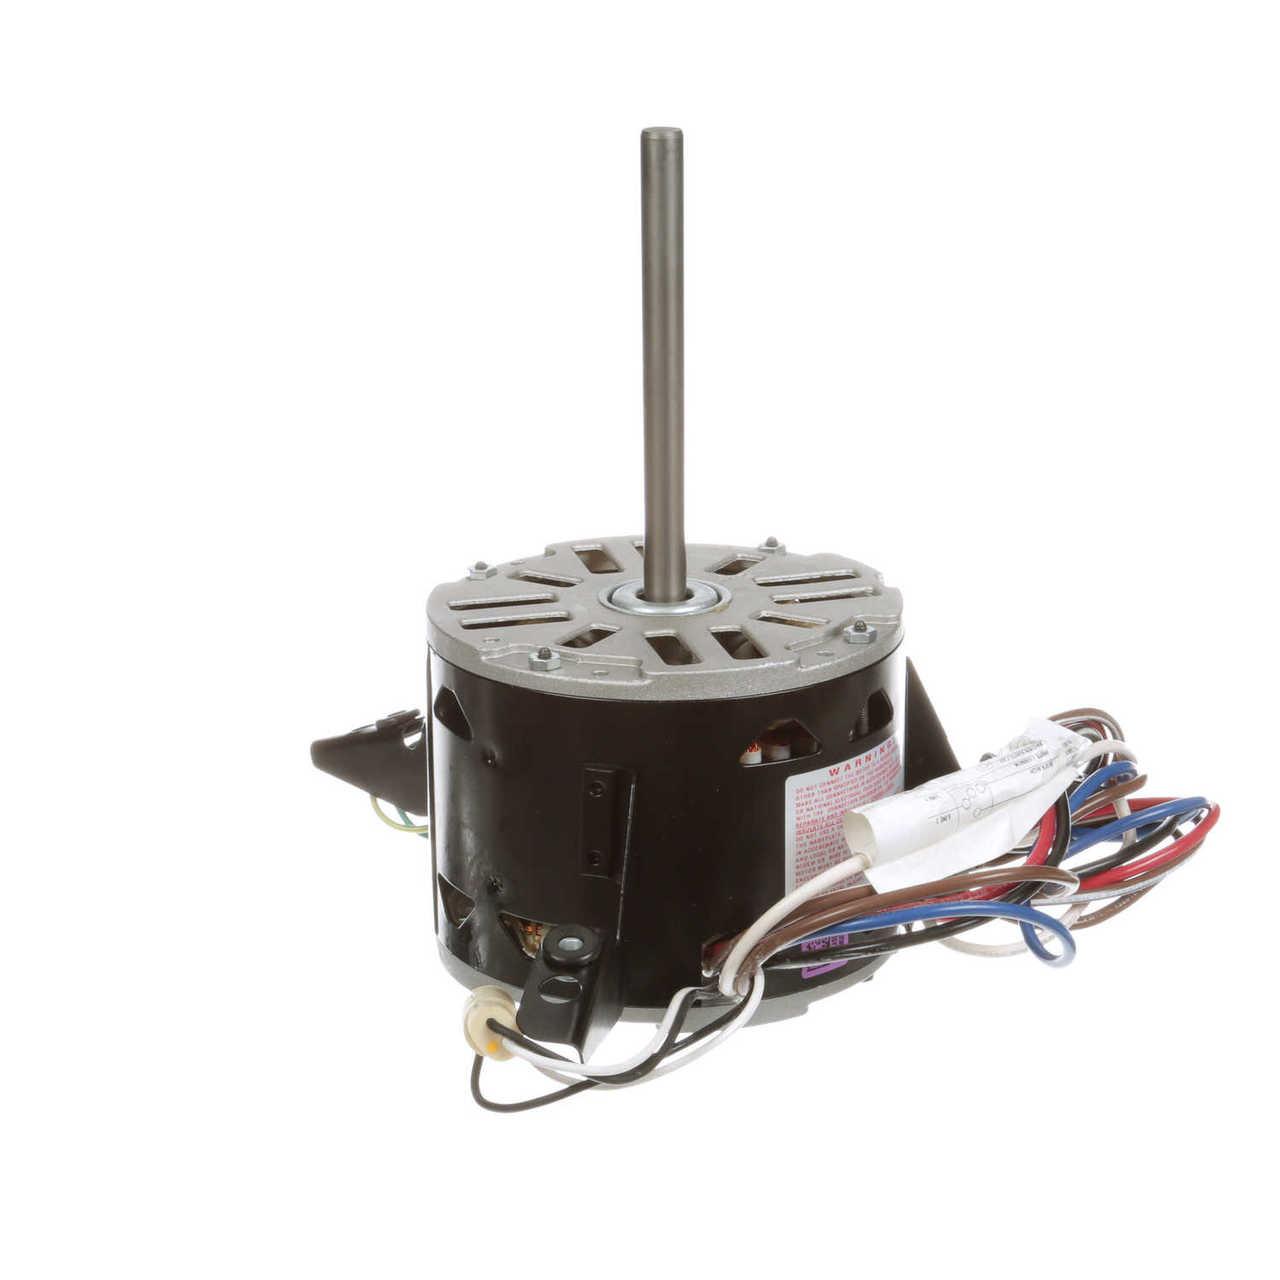 Intertherm Furnace Motor 1/8 hp 1050 RPM 2-Speed 115V